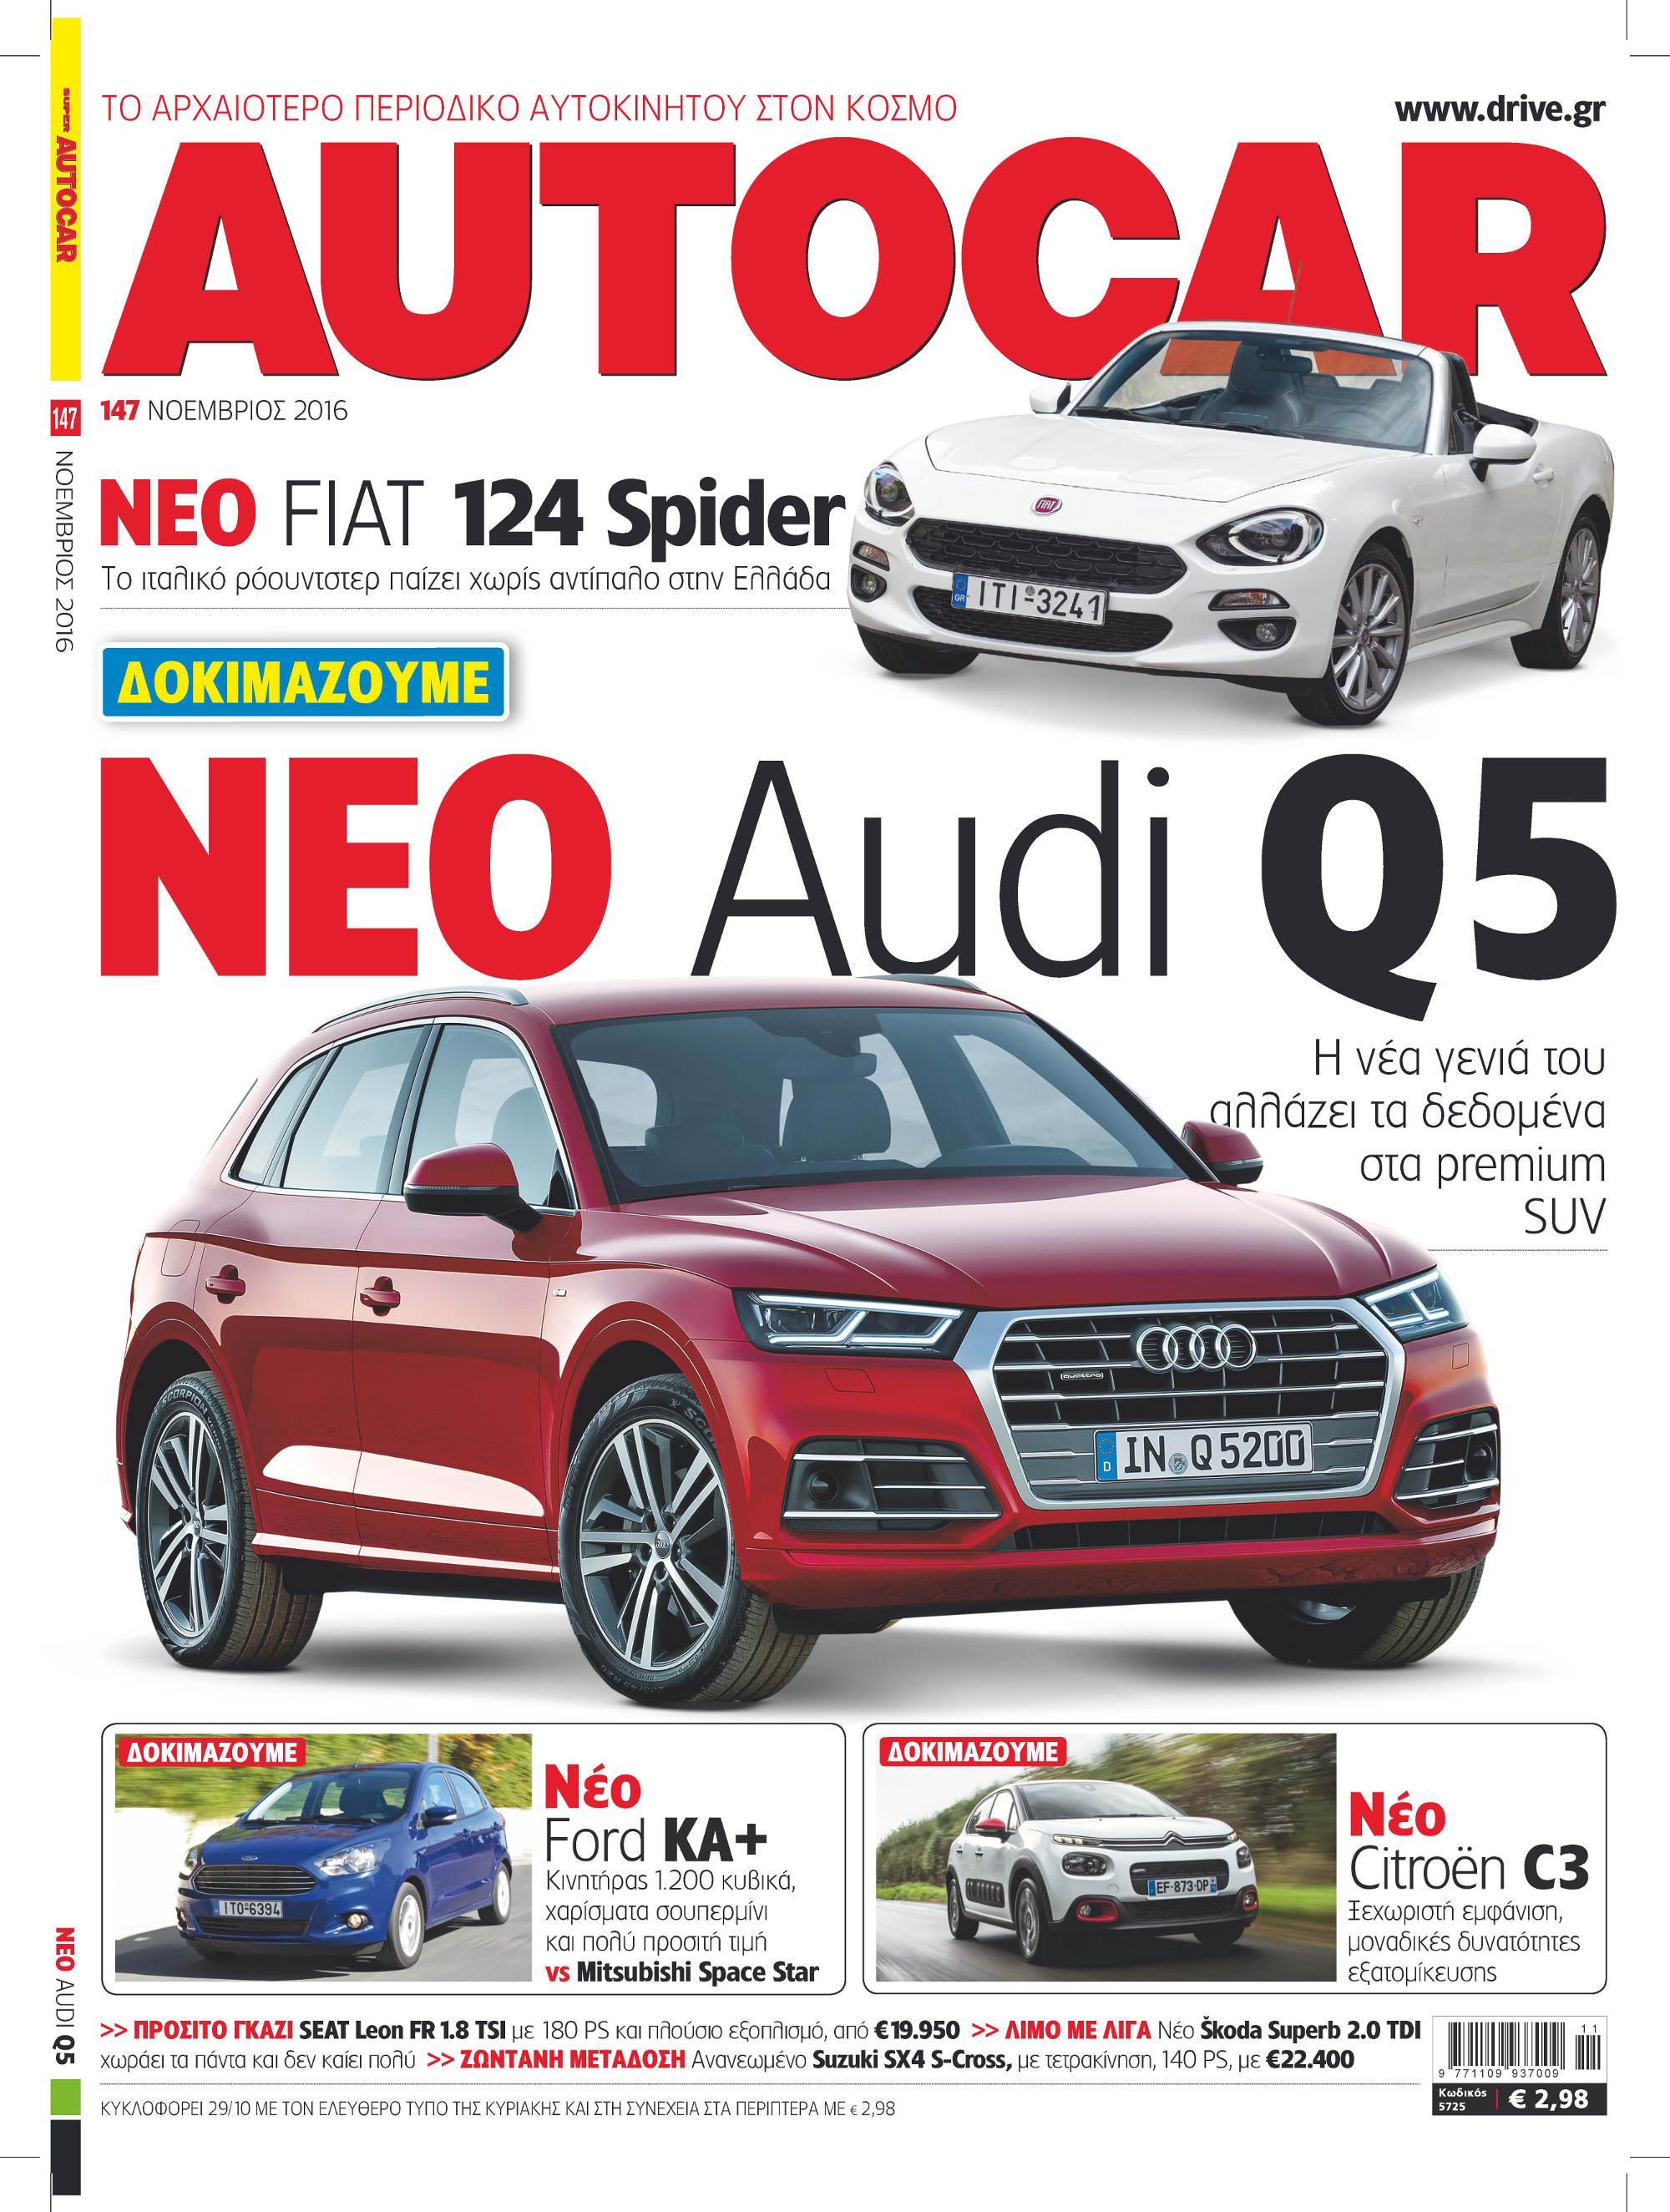 AUTOCAR_COVER_147-3 Μη χάσετε τον Ελεύθερο Τύπο της Κυριακής που κυκλοφορεί εκτάκτως το Σάββατο 29 Οκτωβρίου